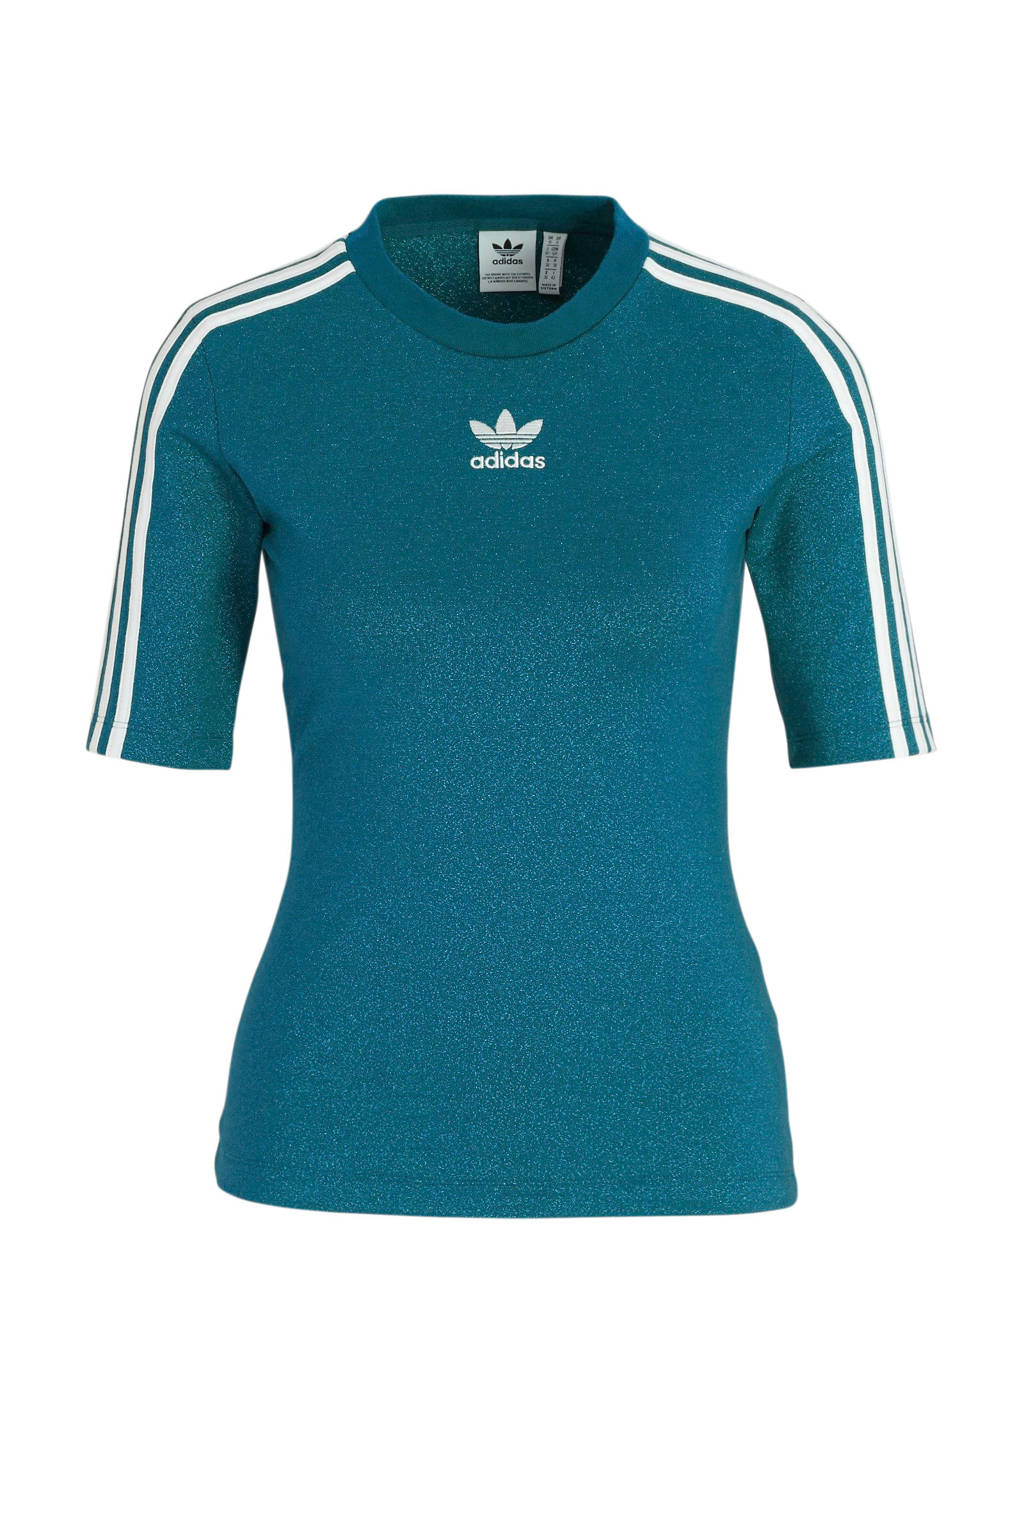 adidas Originals T-shirt petrol, Petrol/wit